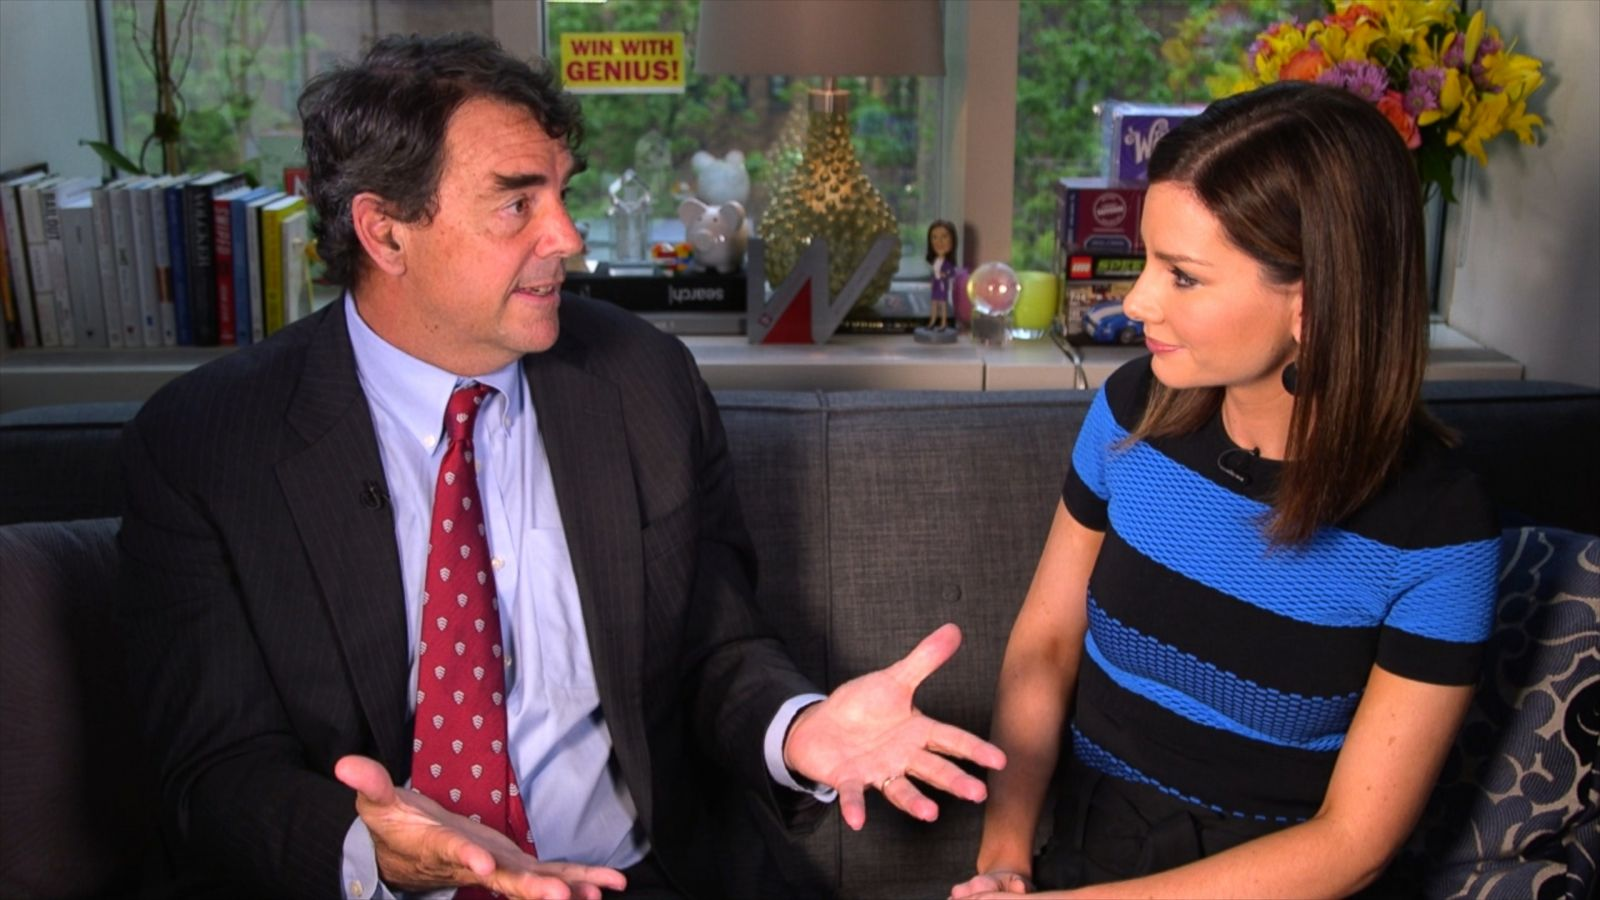 VIDEO: Tim Draper on Real Biz with Rebecca Jarvis